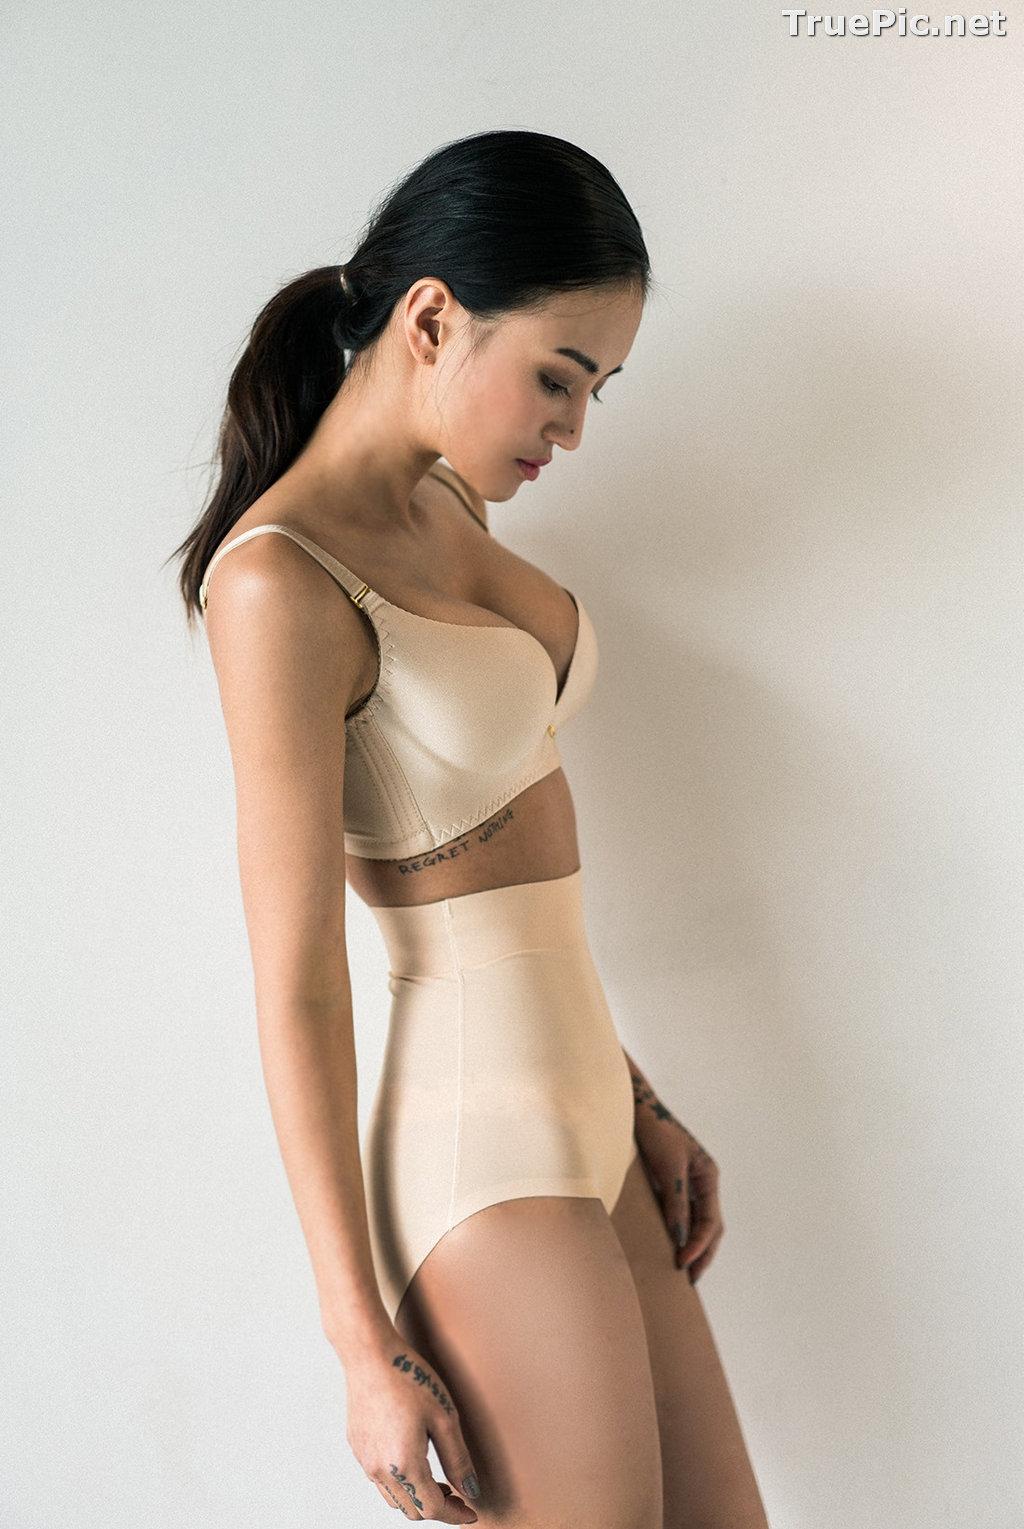 Image Korean Fashion Model – Baek Ye Jin – Sexy Lingerie Collection #5 - TruePic.net - Picture-2